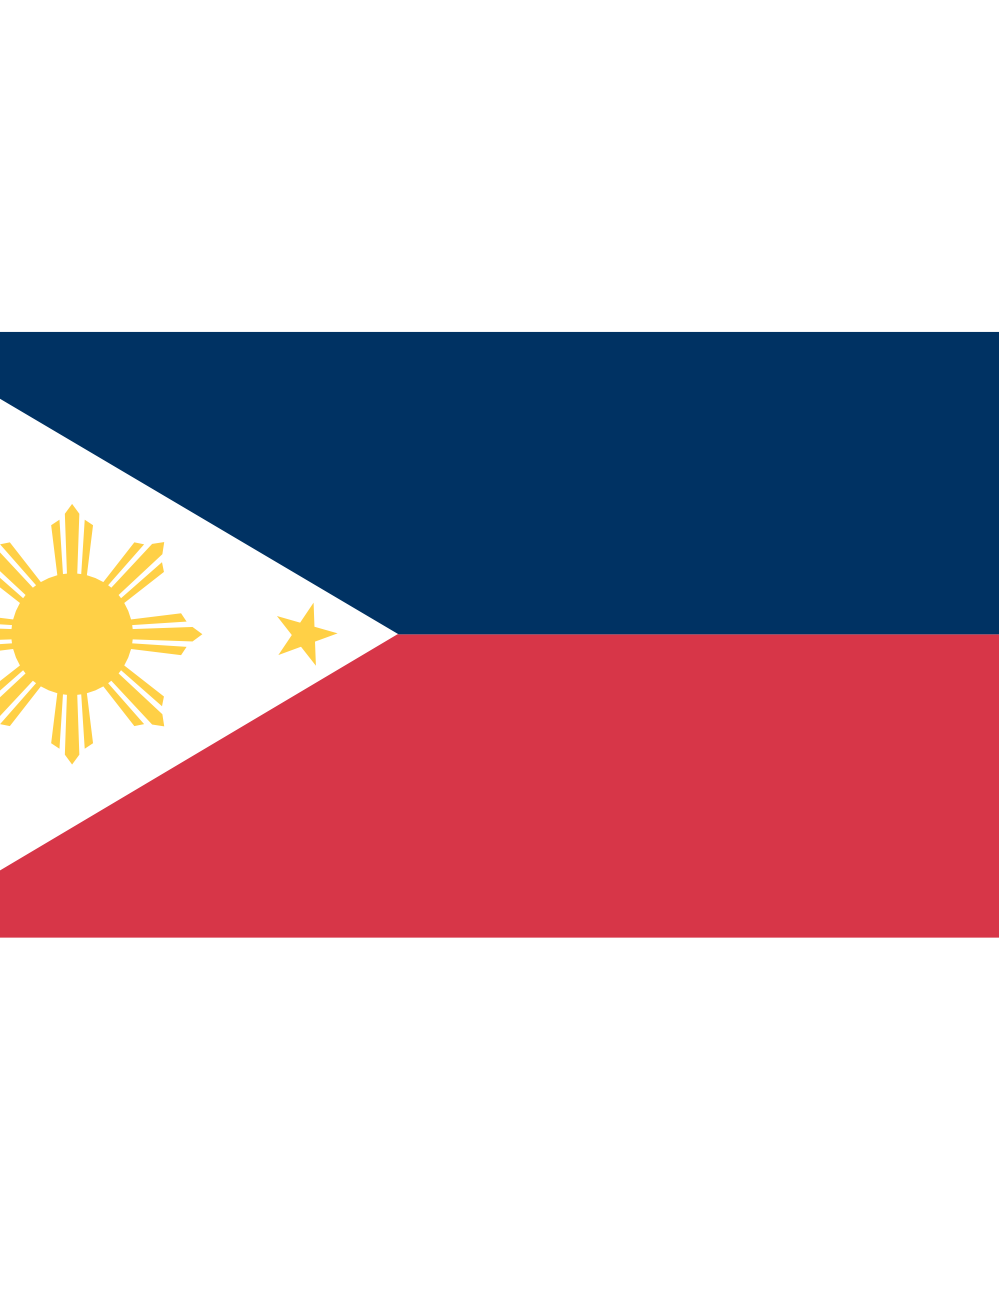 clip art philippine flag - photo #15